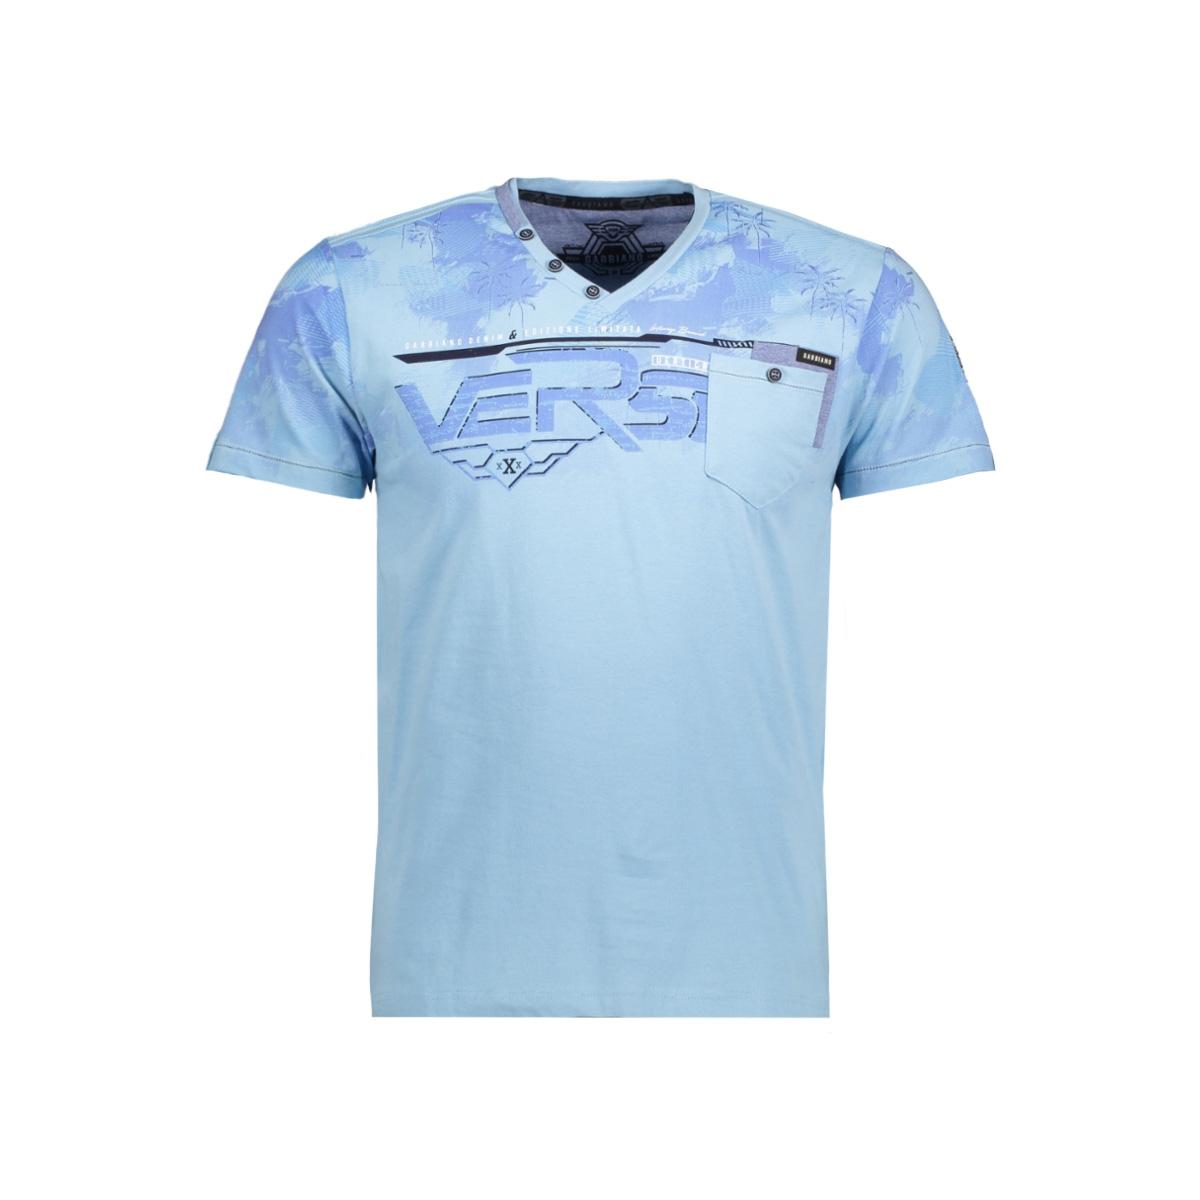 13871 gabbiano t-shirt light blue